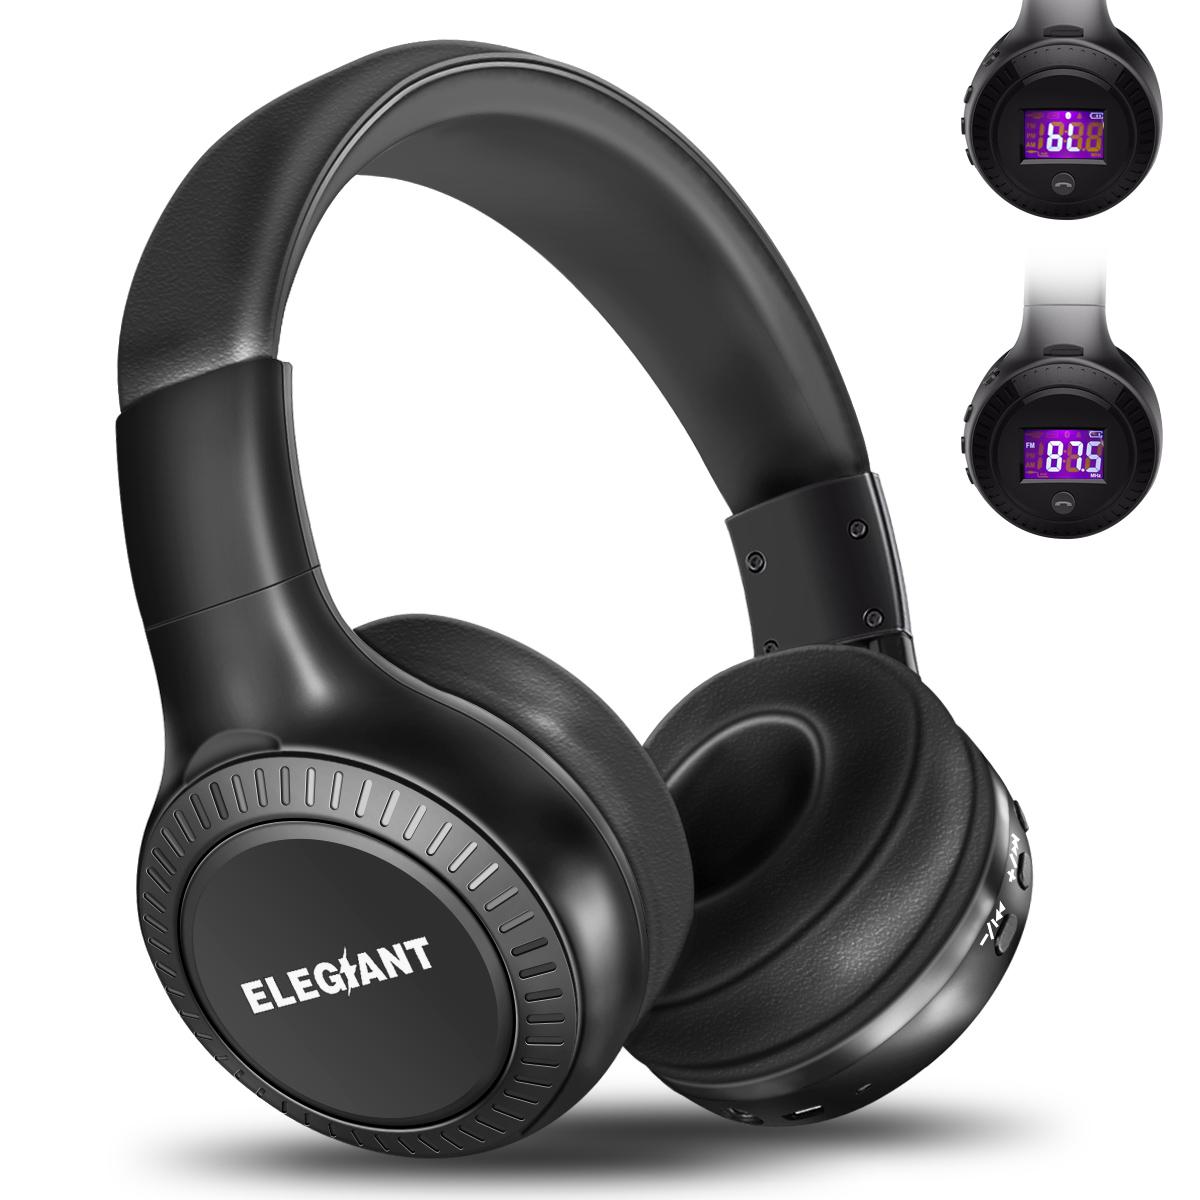 Iphone 8 earphones bluetooth - iphone 8 headphones noise canceling